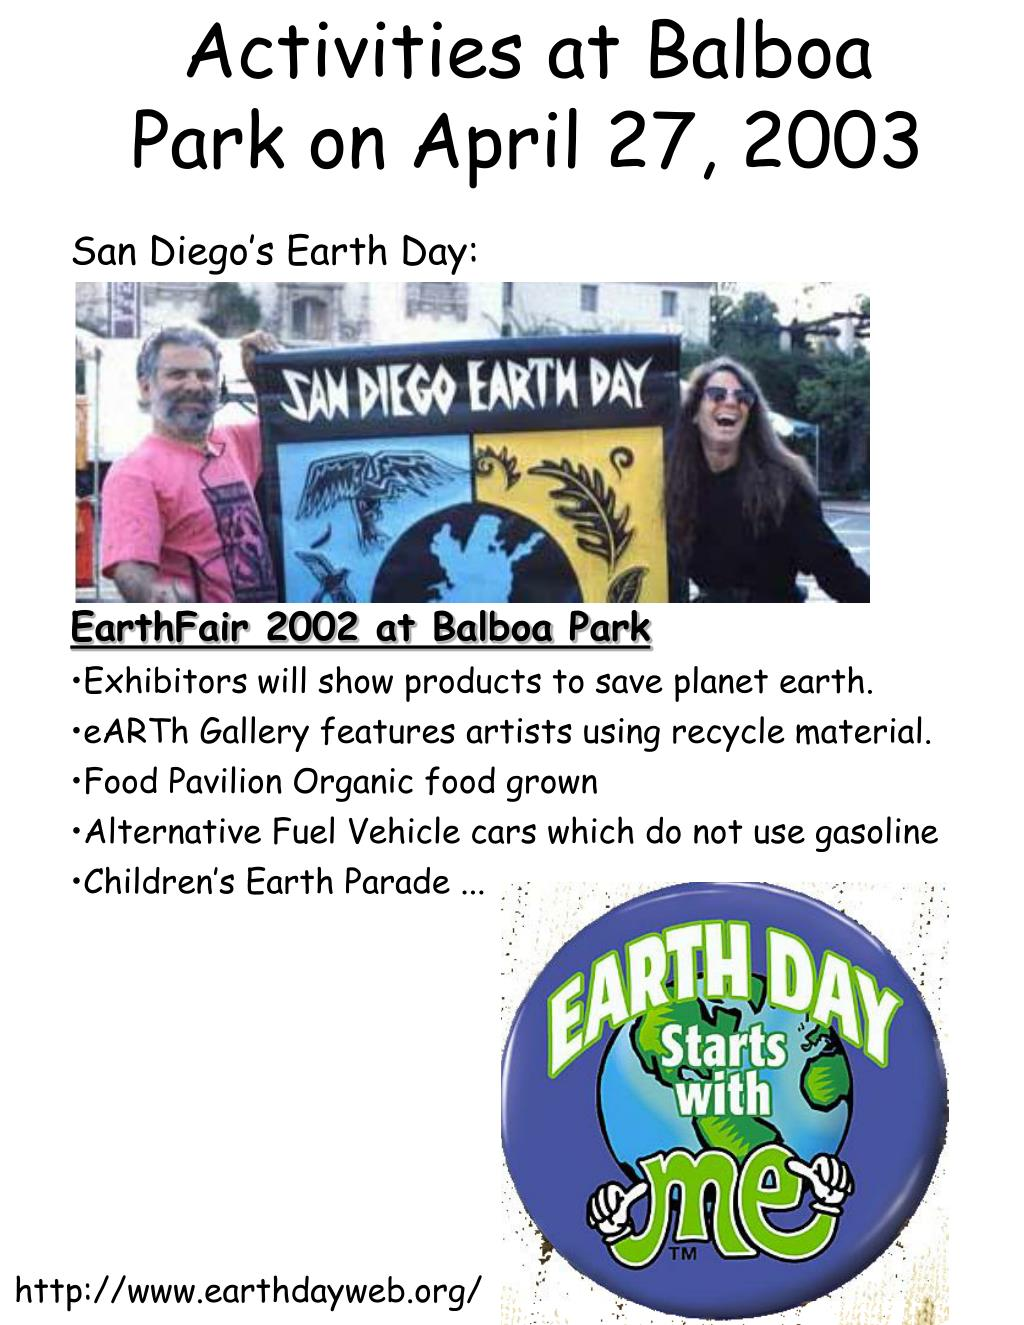 Activities at Balboa Park on April 27, 2003